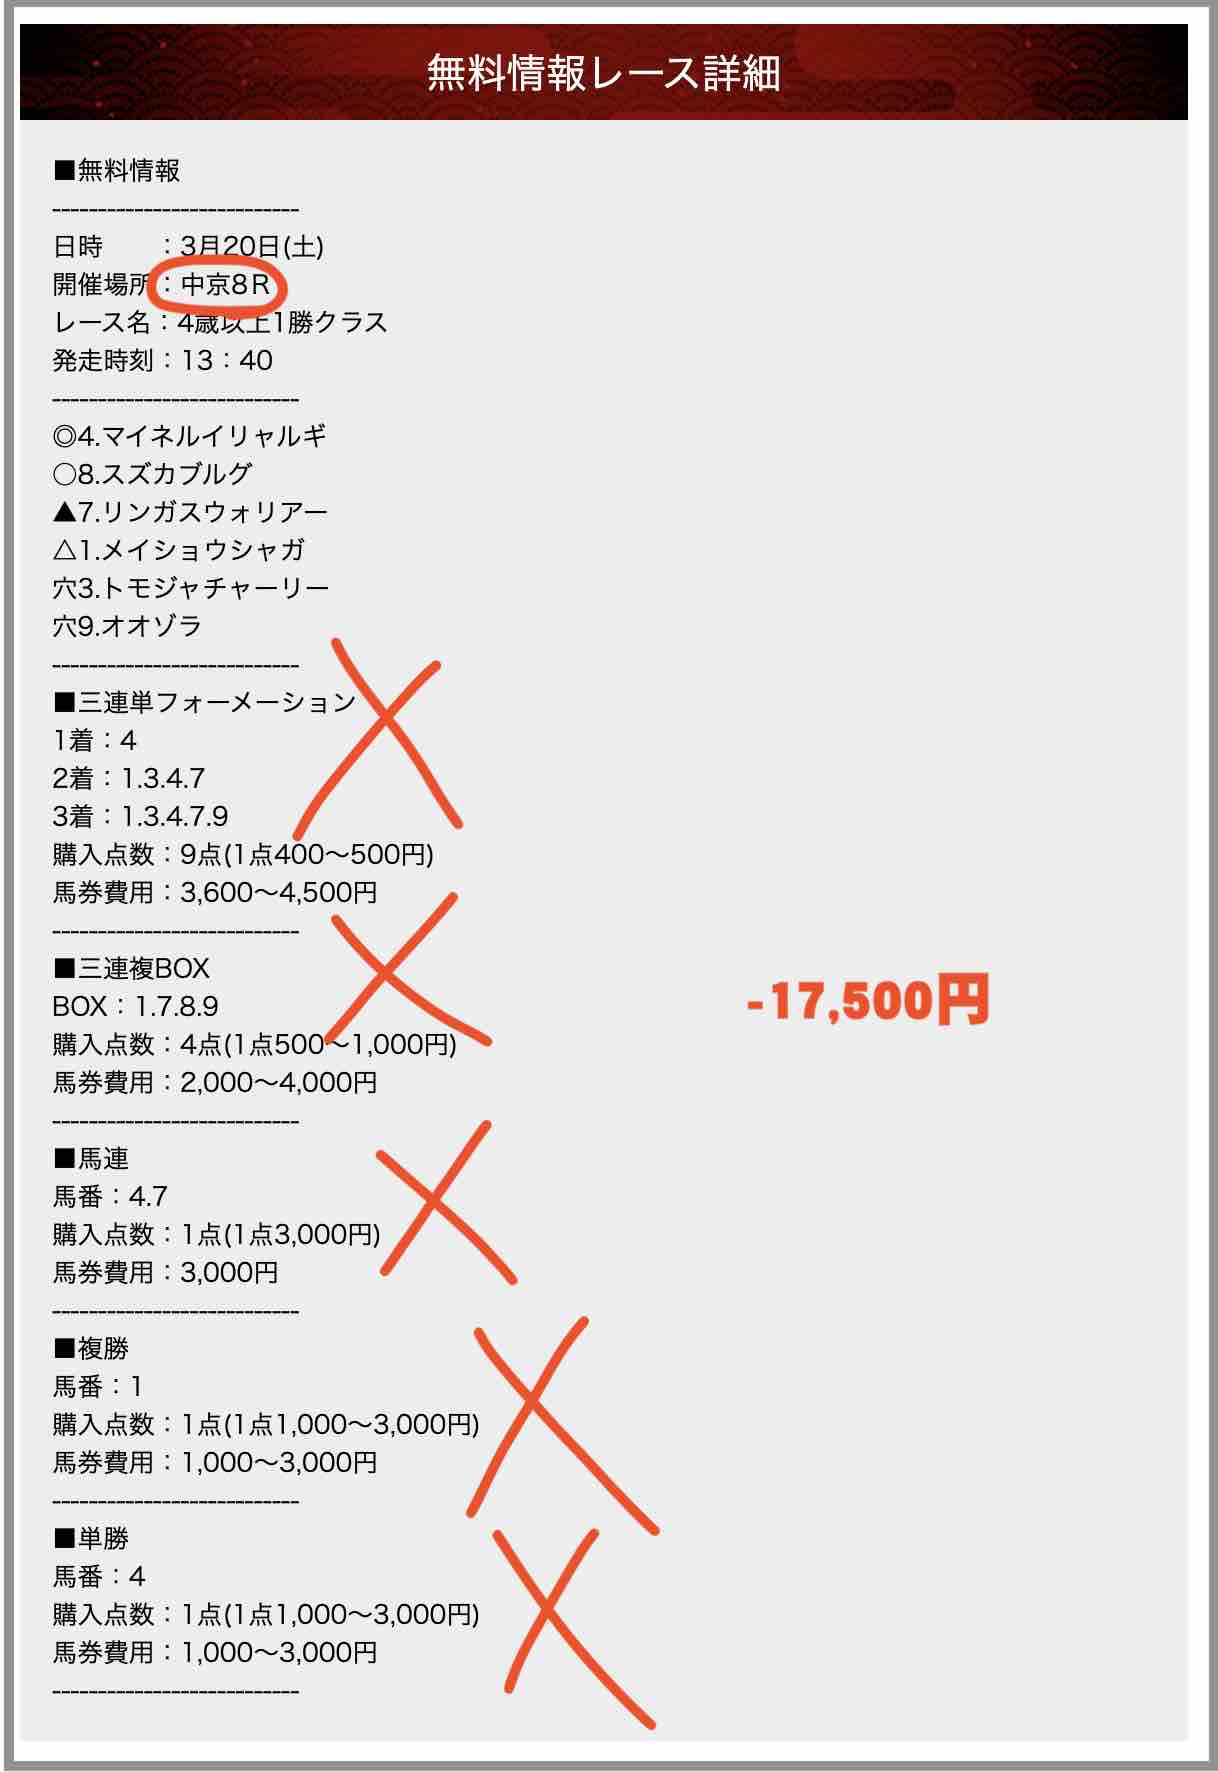 TENKEI(天啓)の無料予想(無料情報)の抜き打ち検証